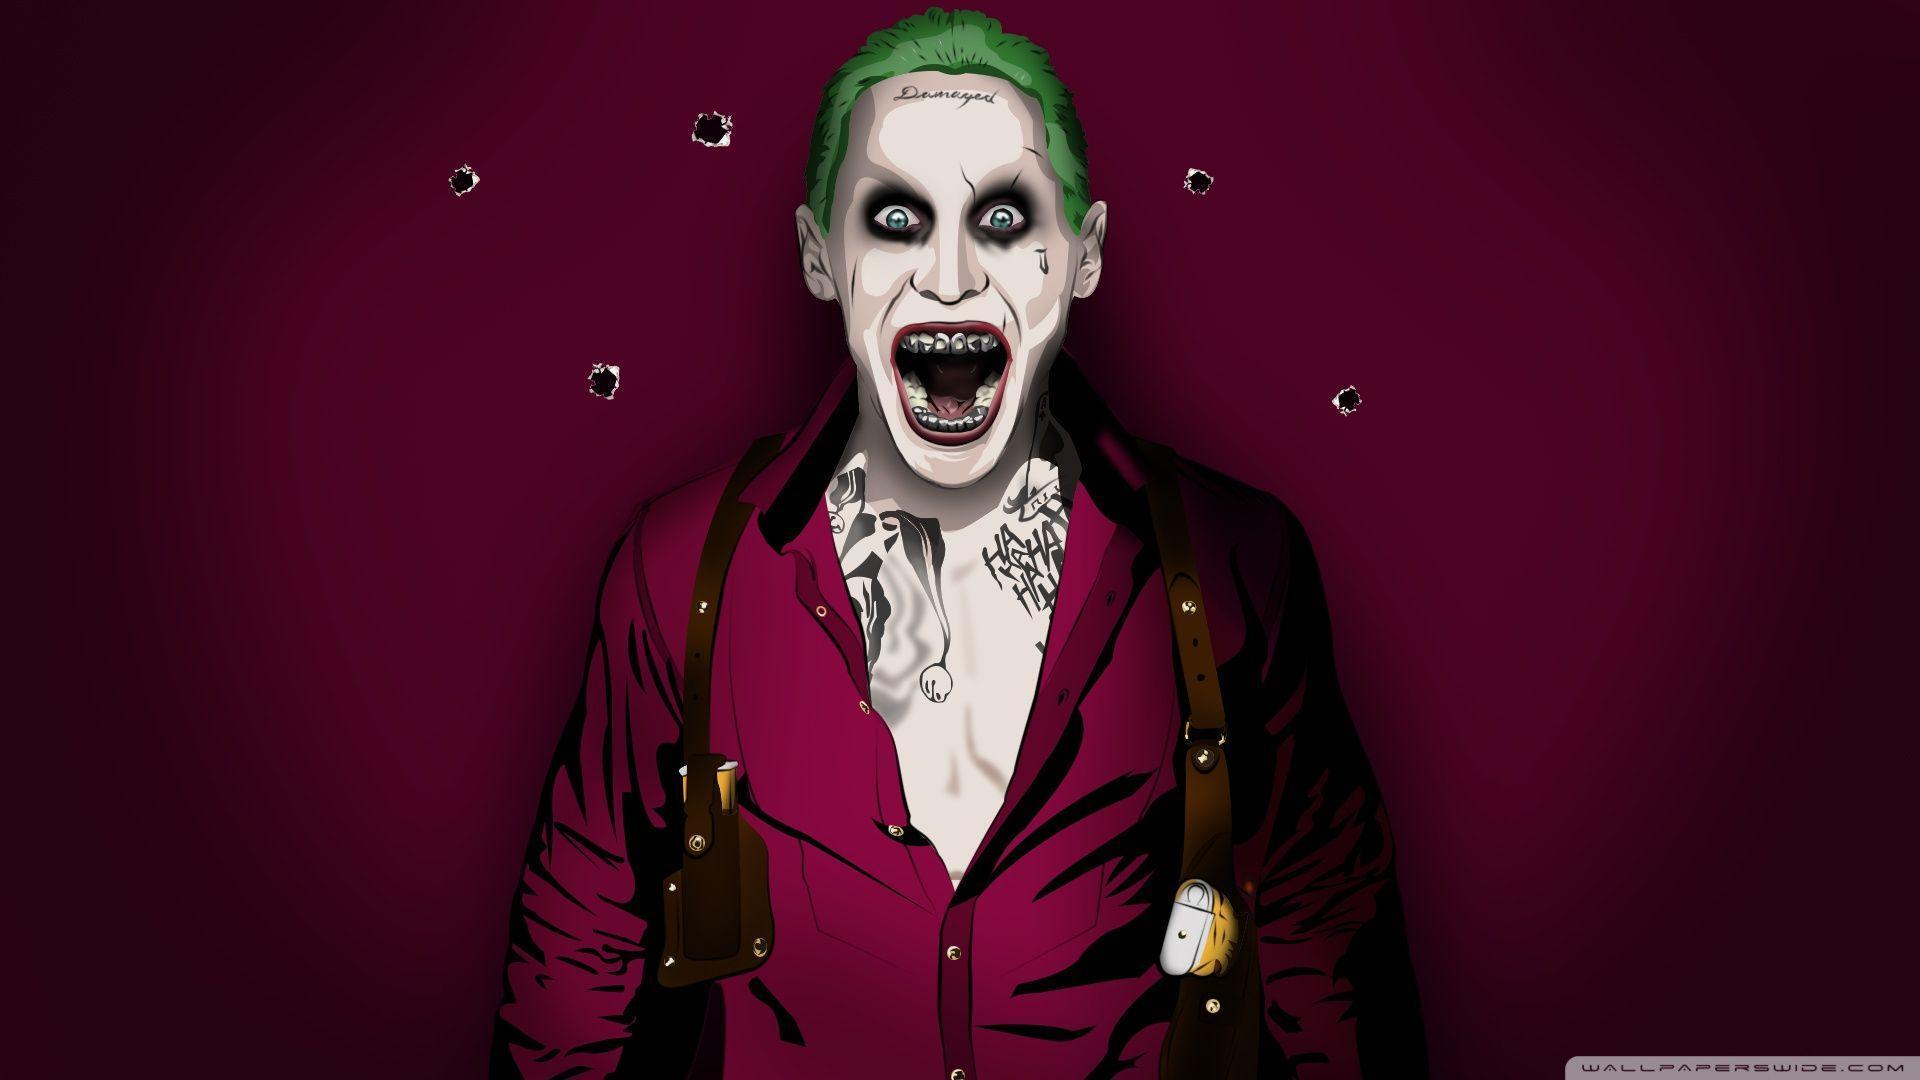 Jared Leto Joker Wallpapers 1920x1080